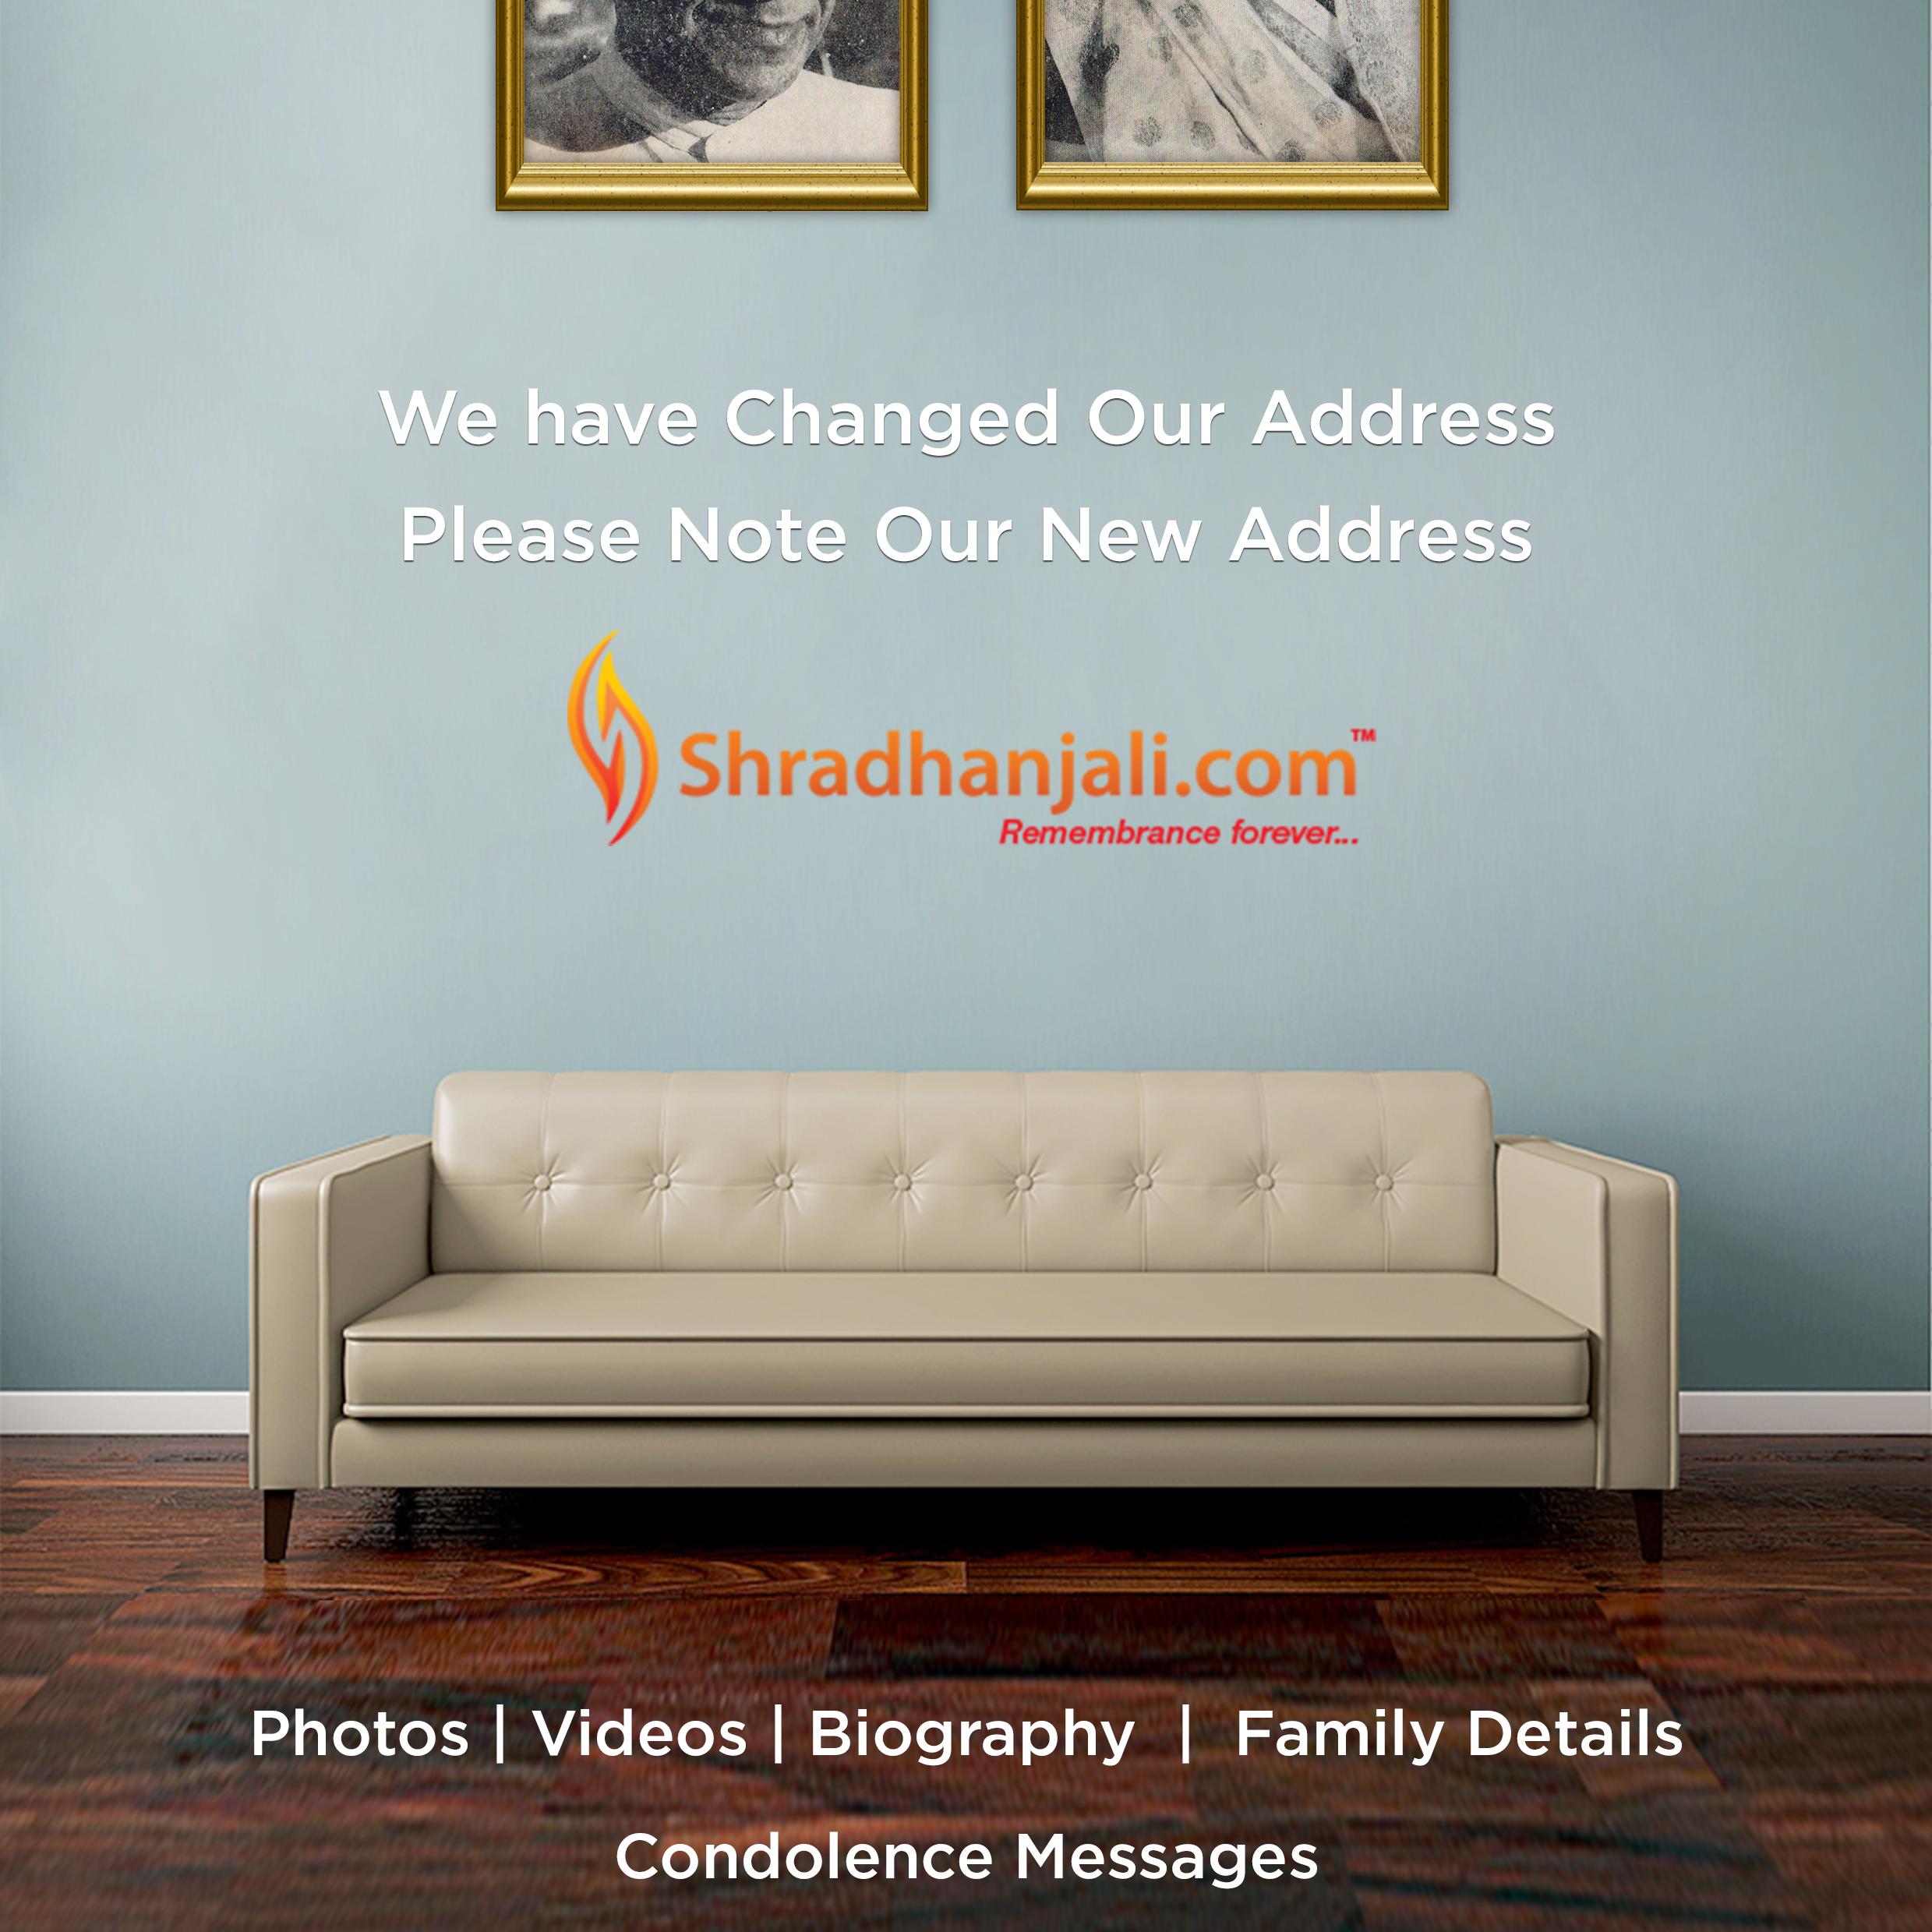 Shradhanjli.com